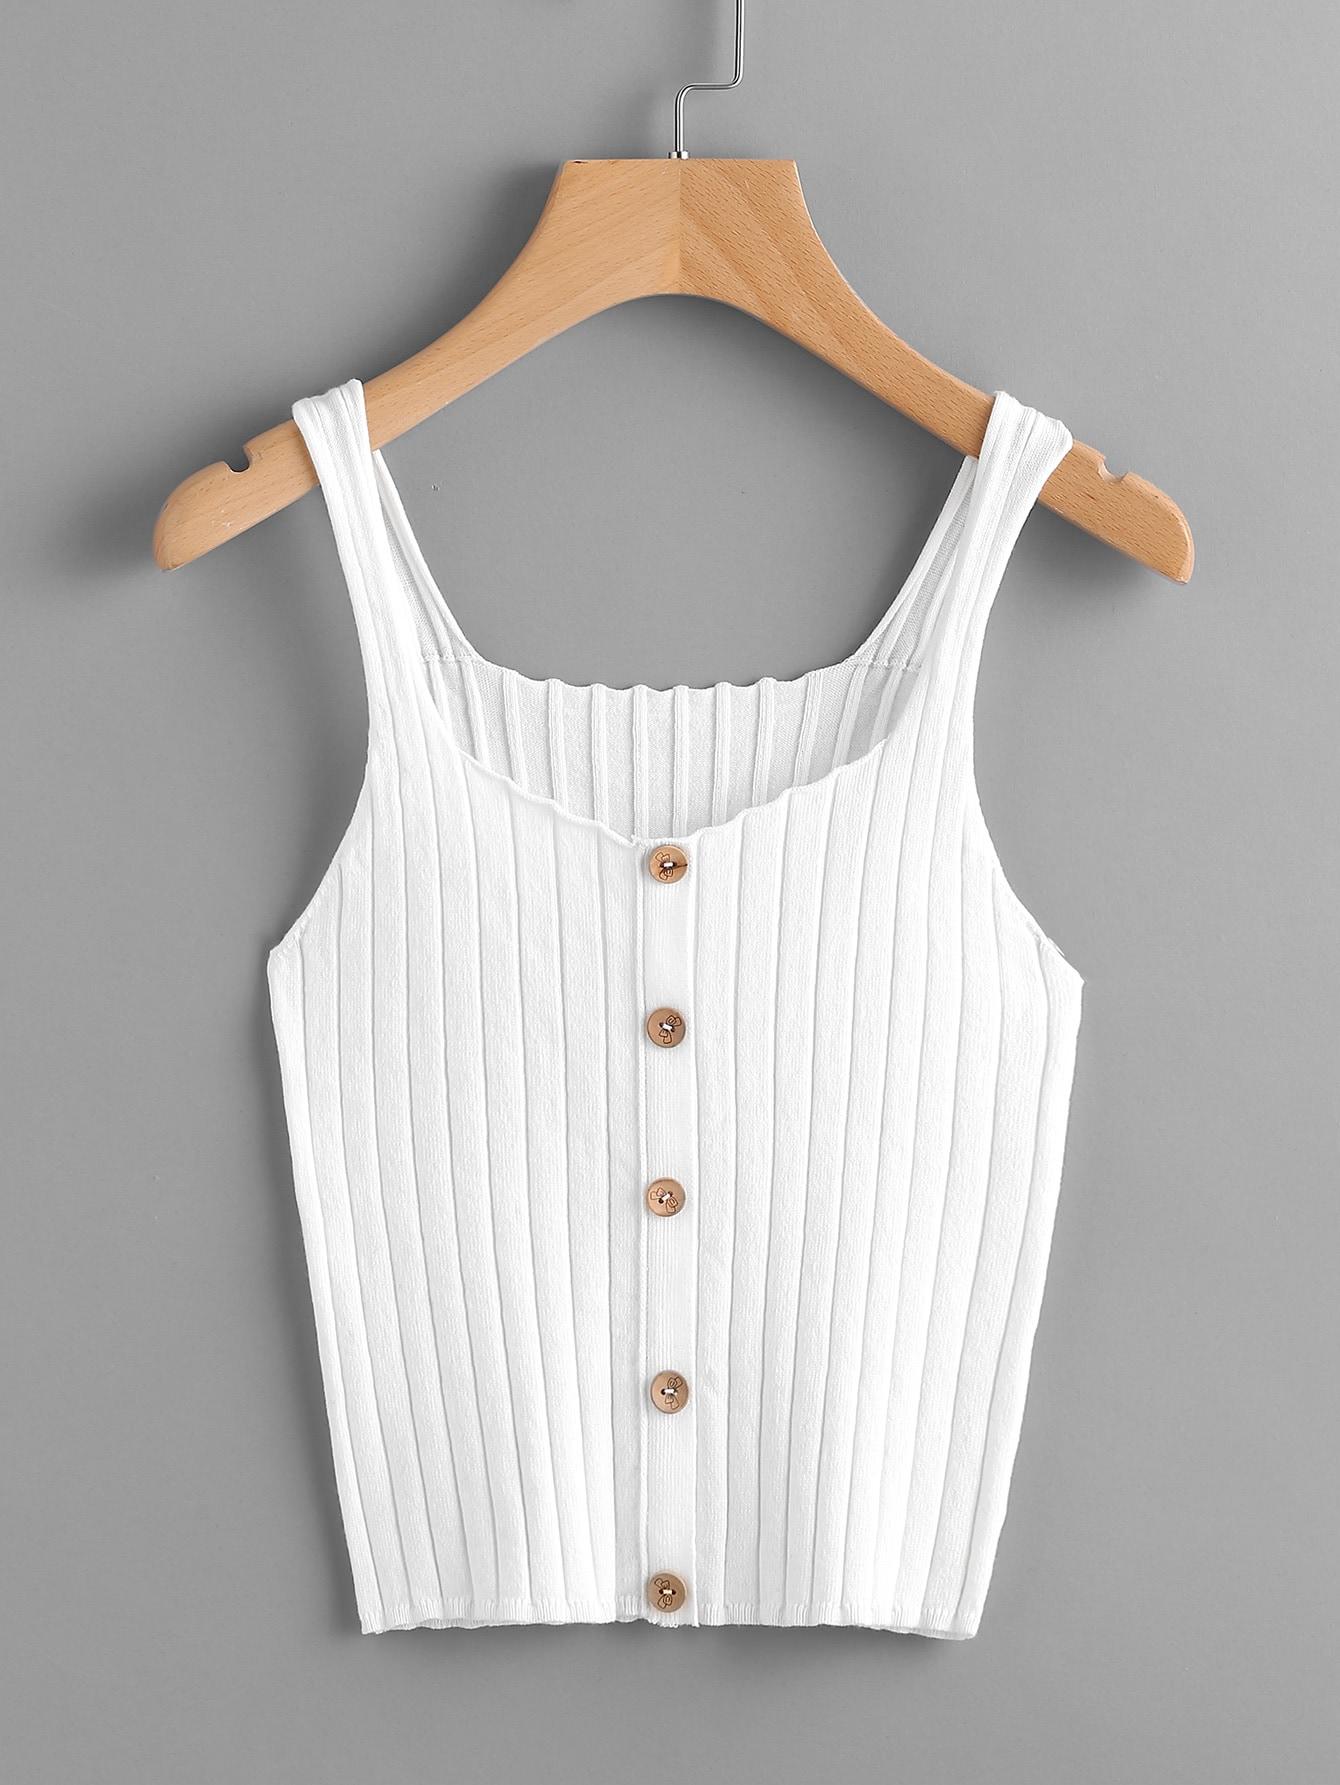 Button Front Rib Knit Tank Top vest170614451